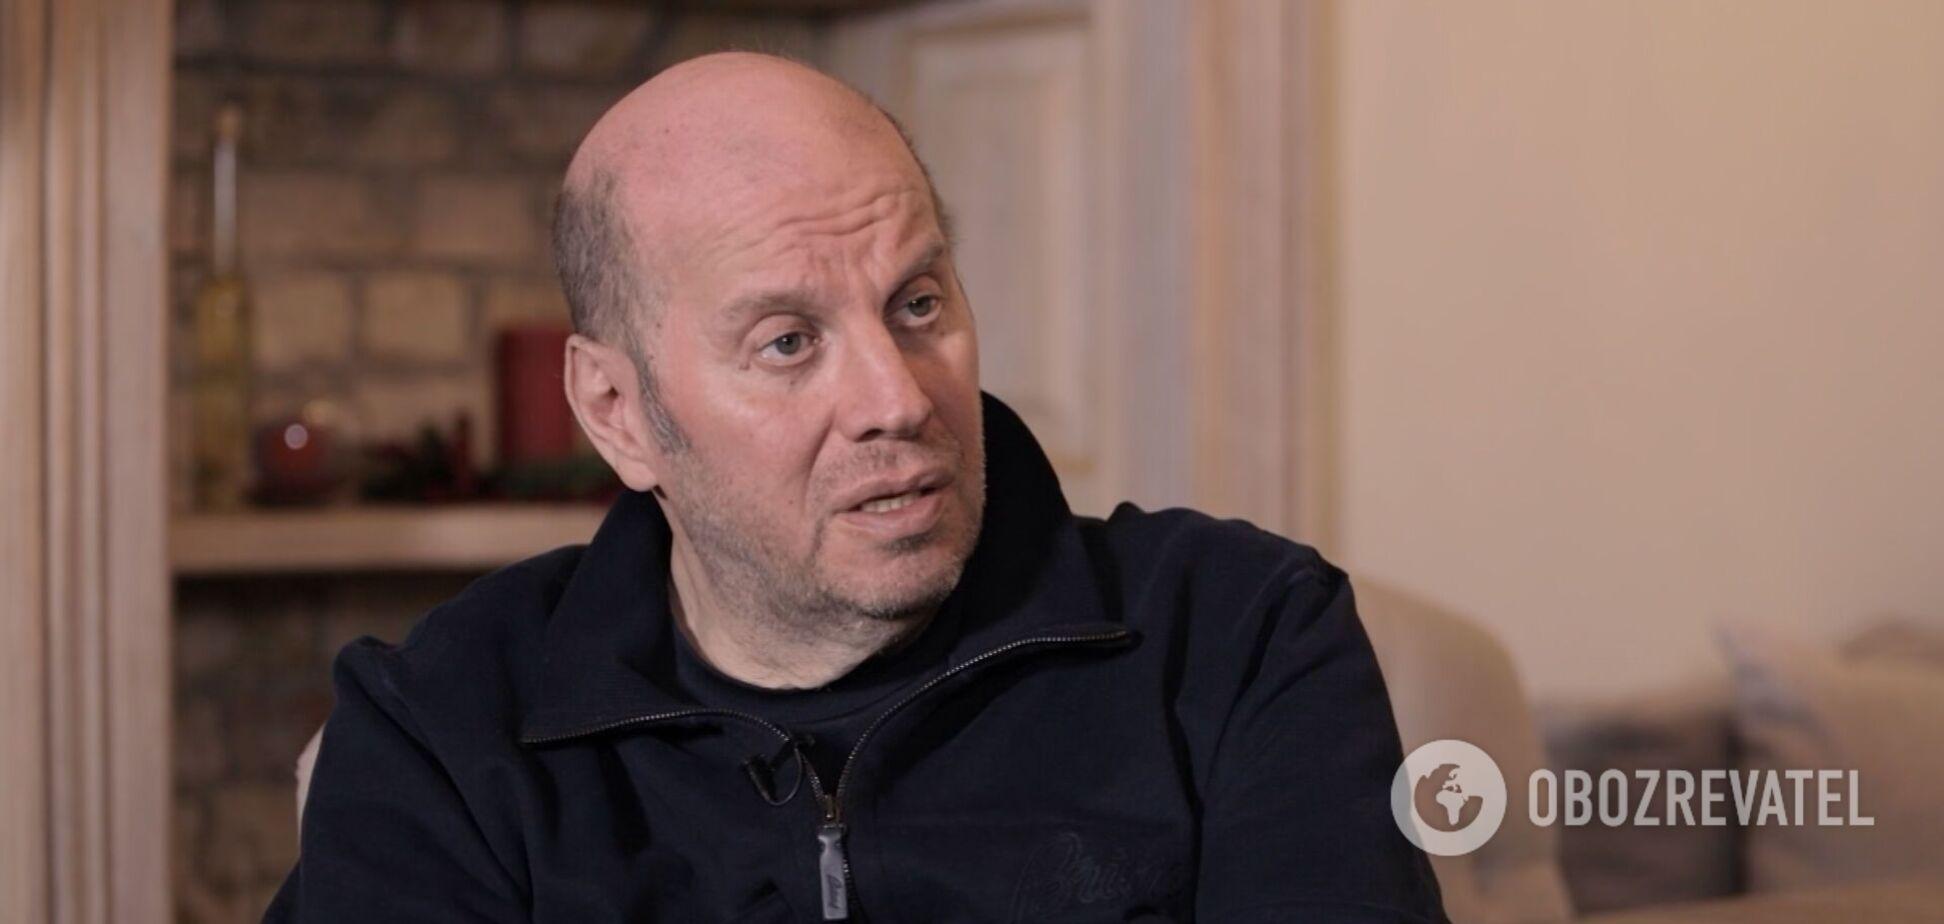 Глава редсовета OBOZREVATEL Михаил Бродский